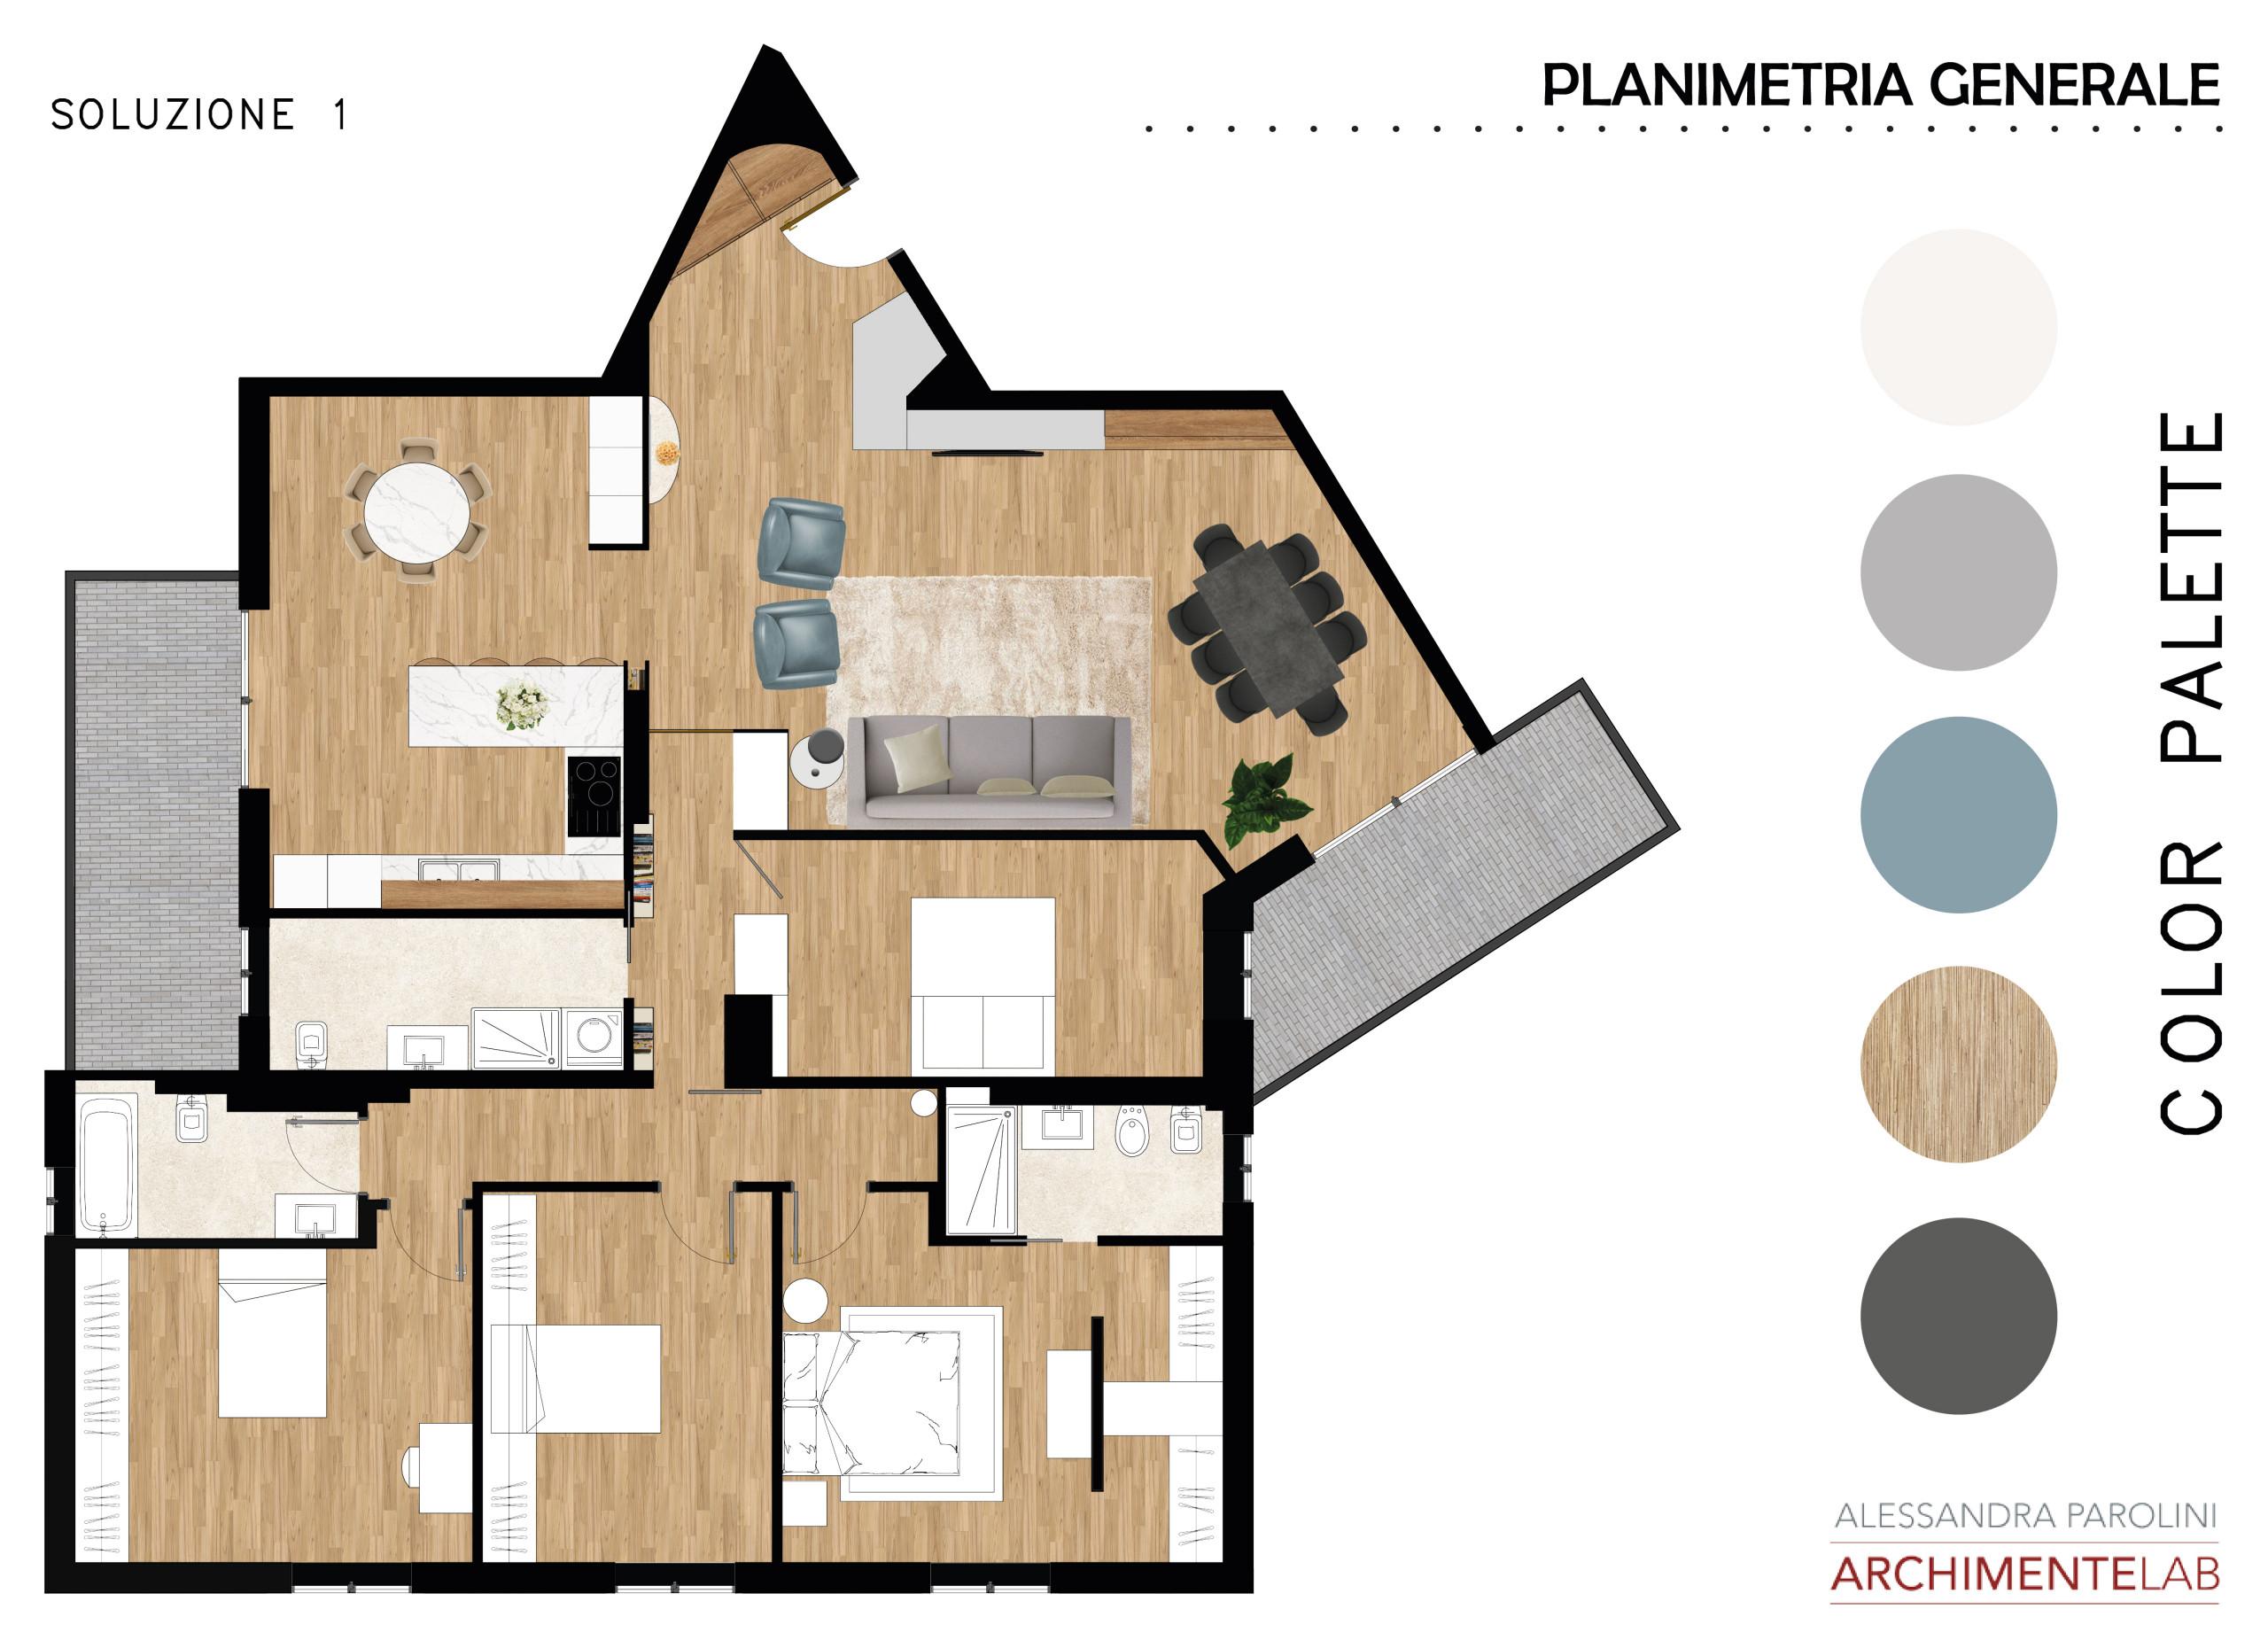 AL HOUSE I 190 mq